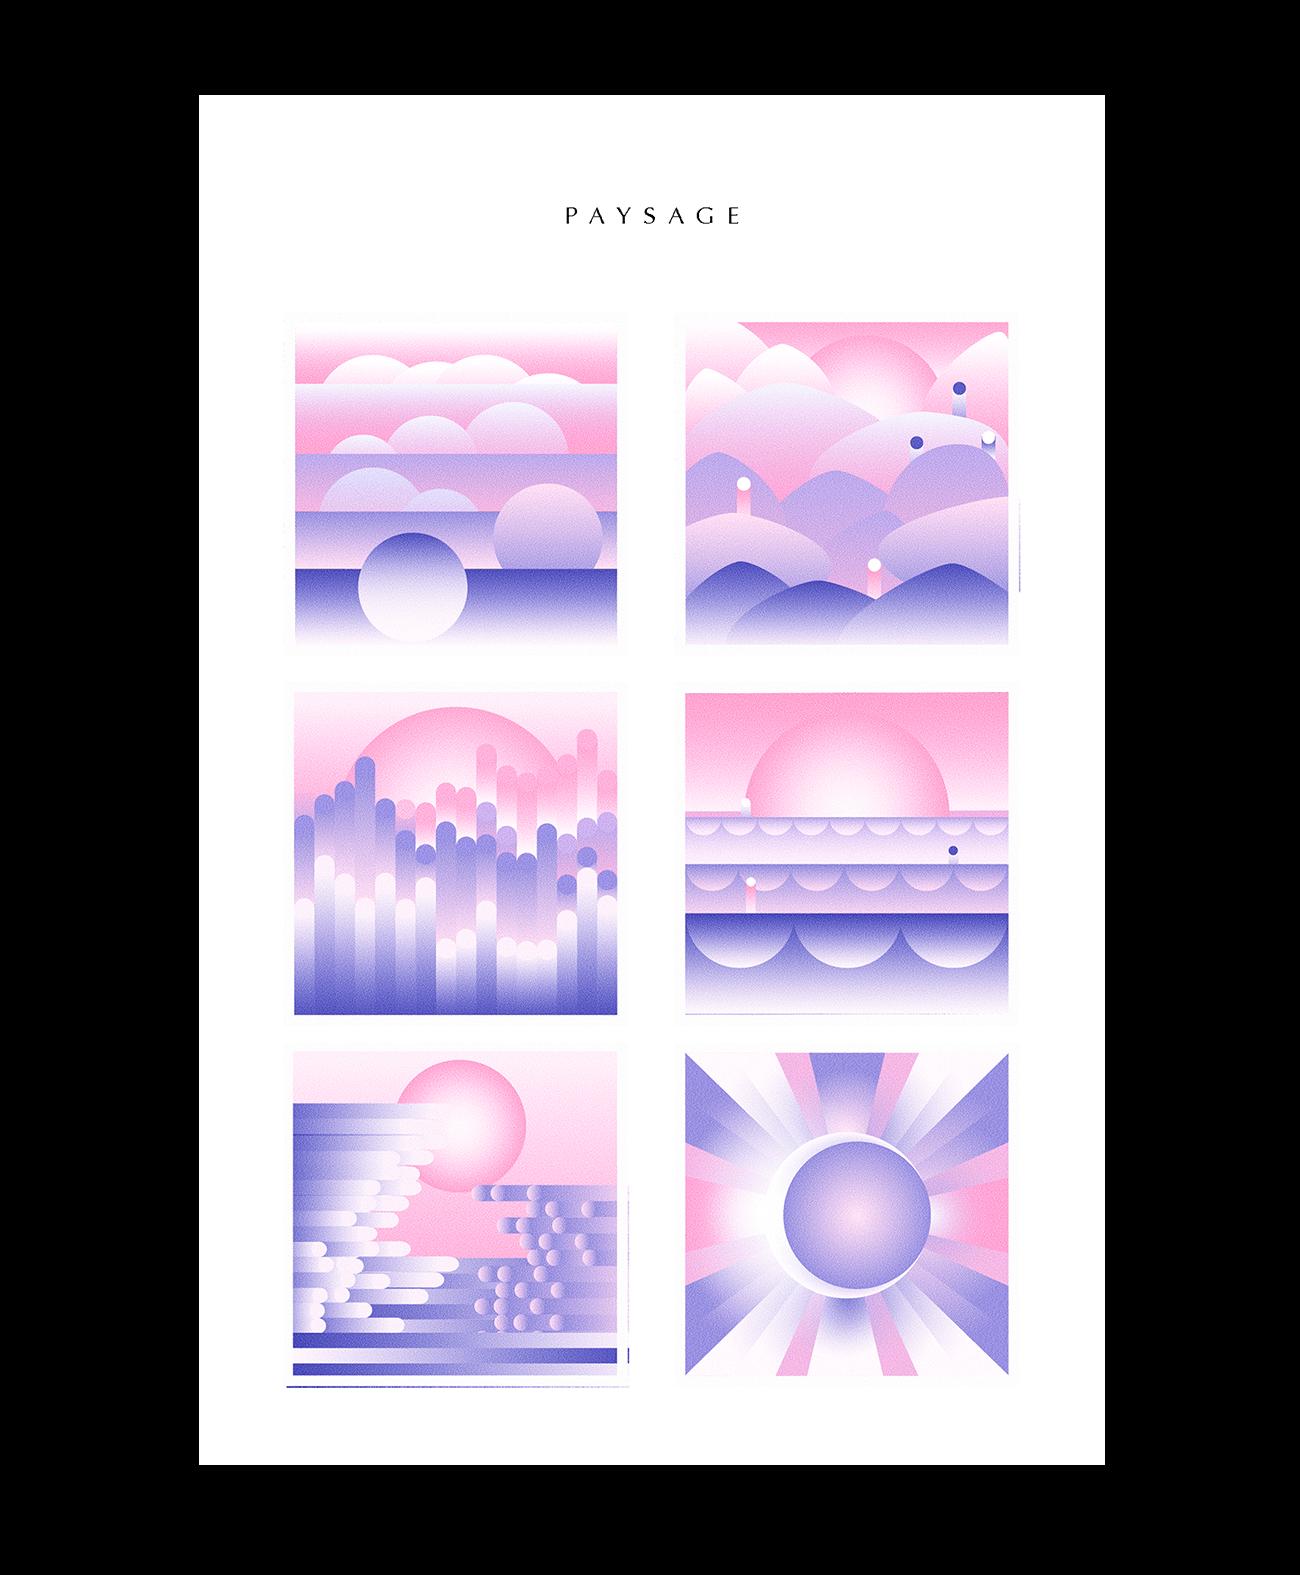 Riso Illustration paysage